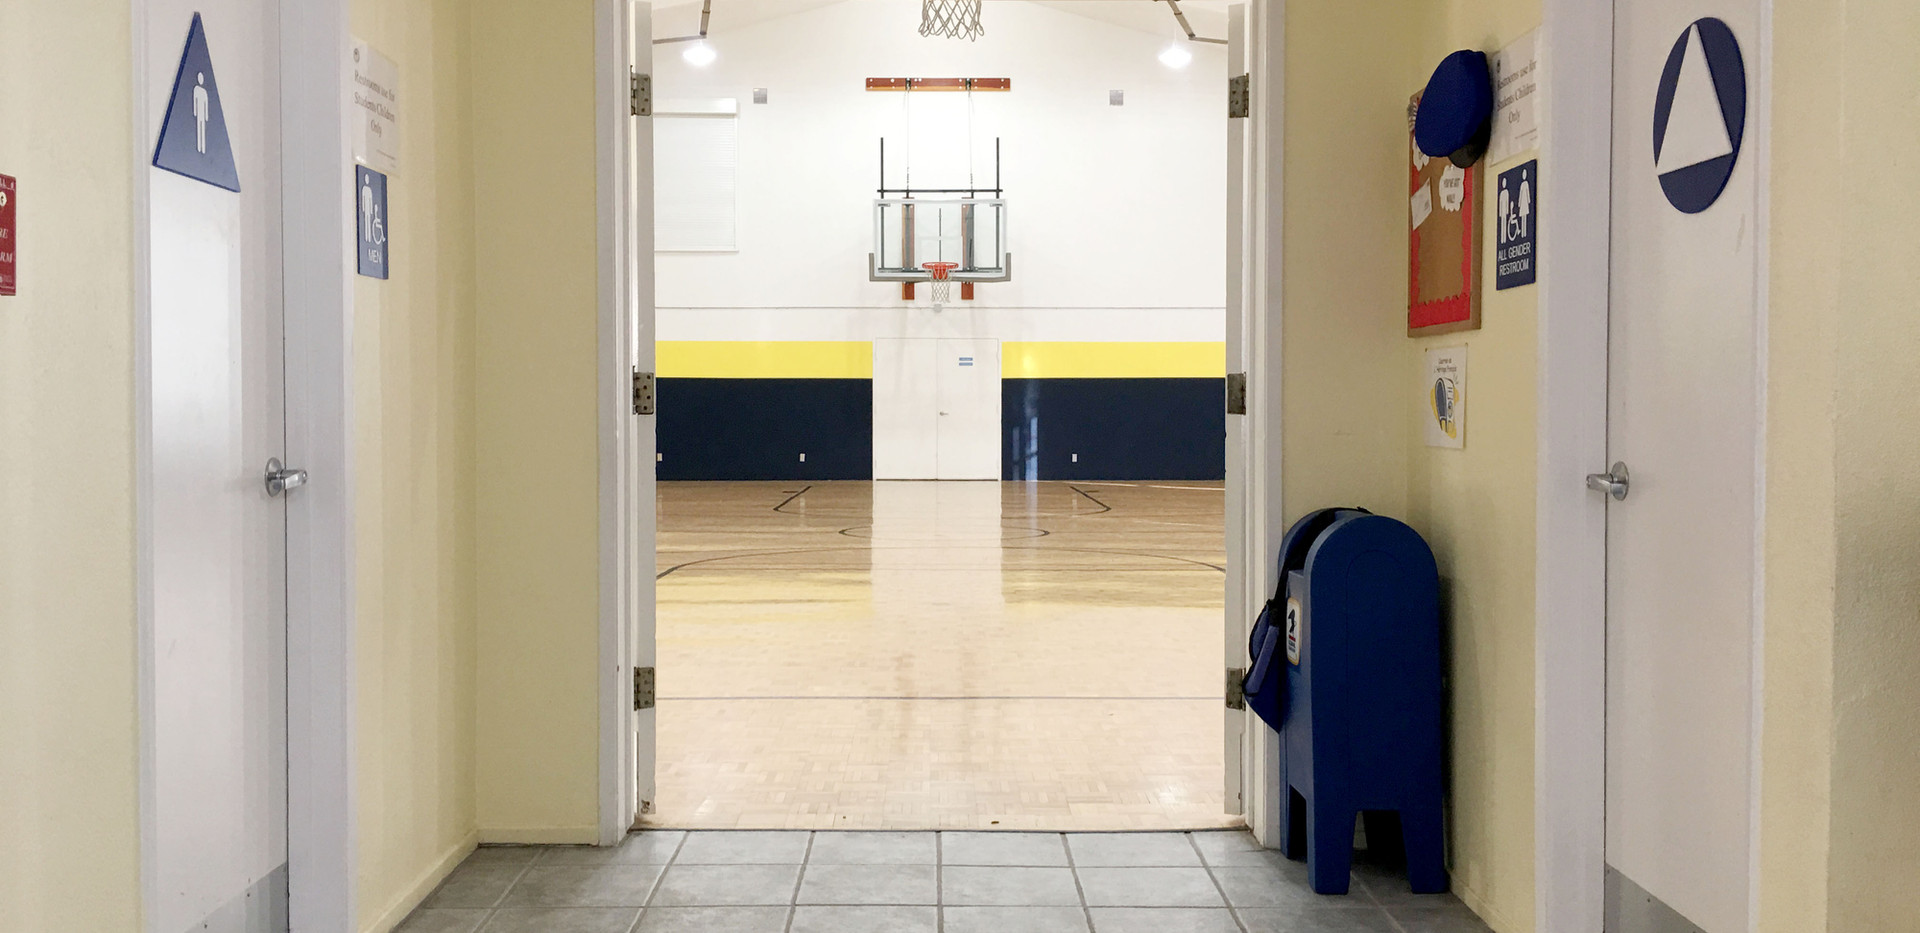 facilities_0021_IMG_0642.JPG.jpg